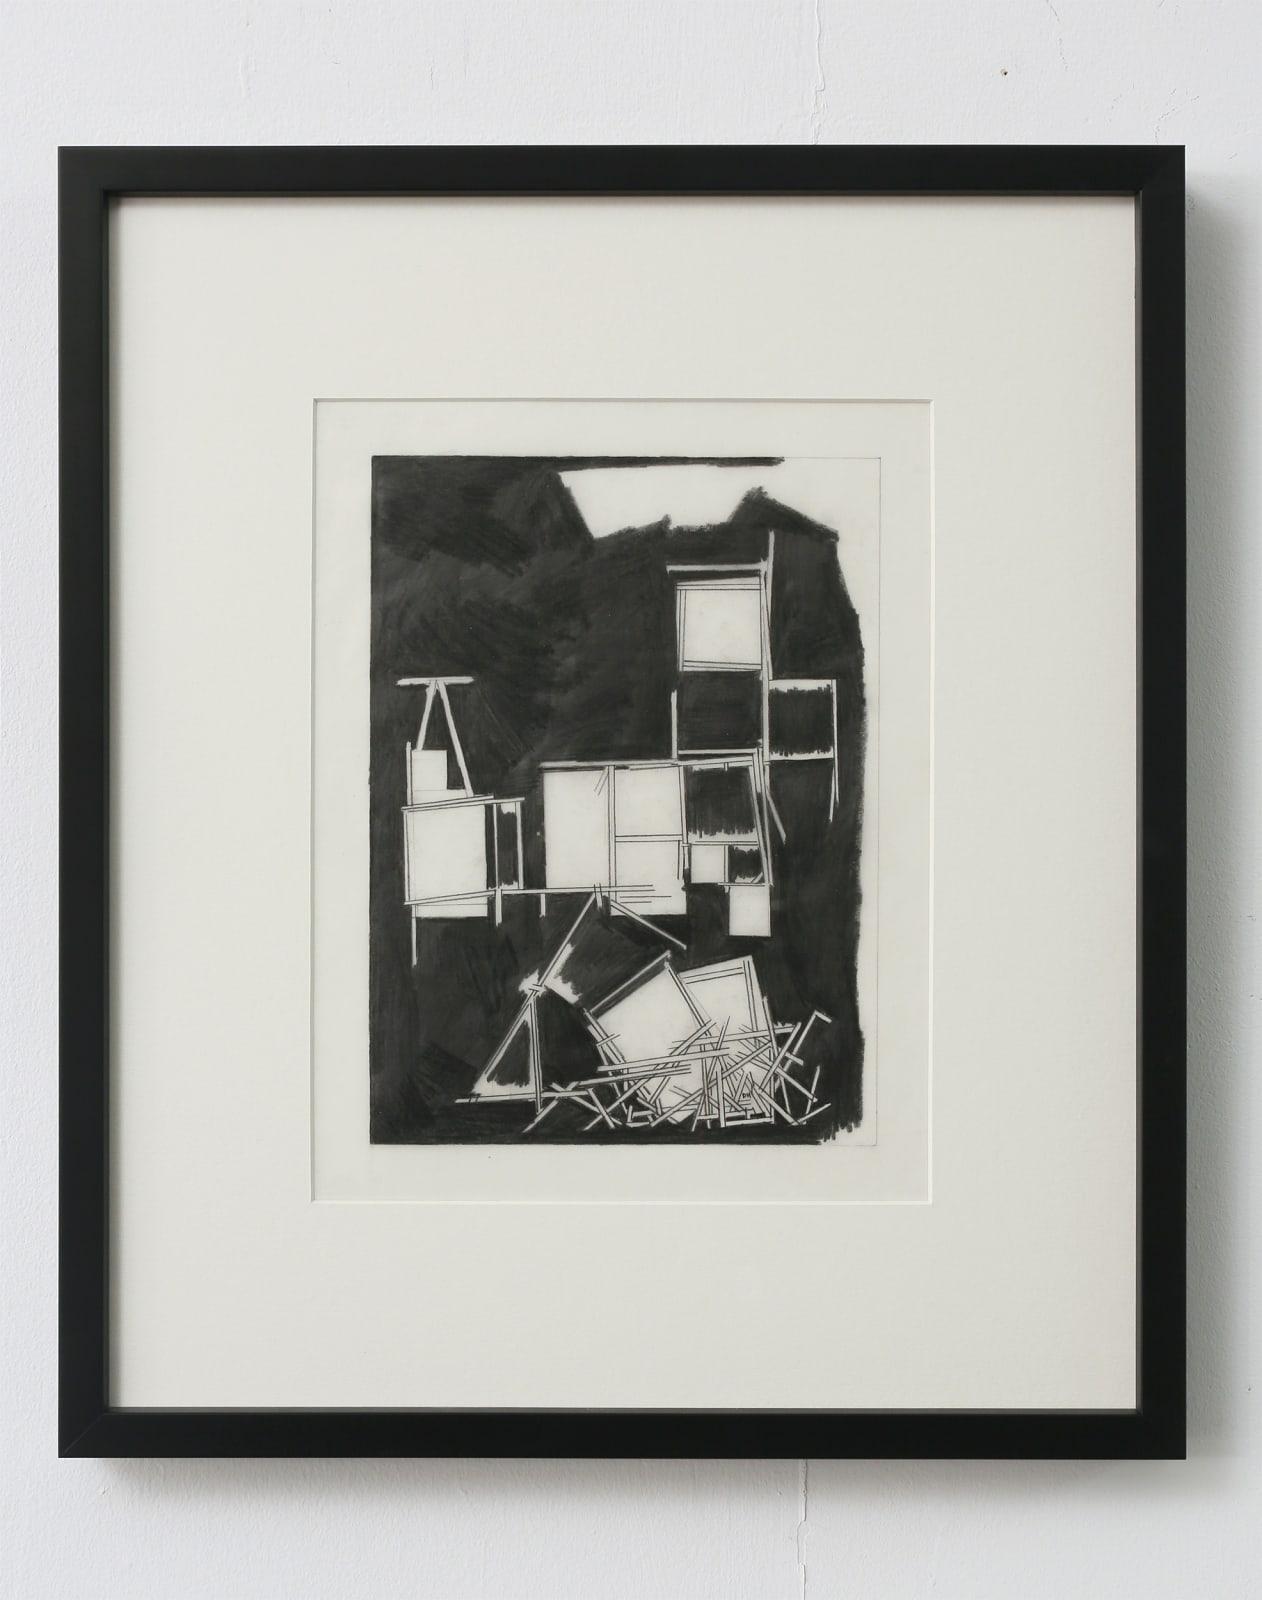 Dil Hildebrand, Untitled #1, 2012